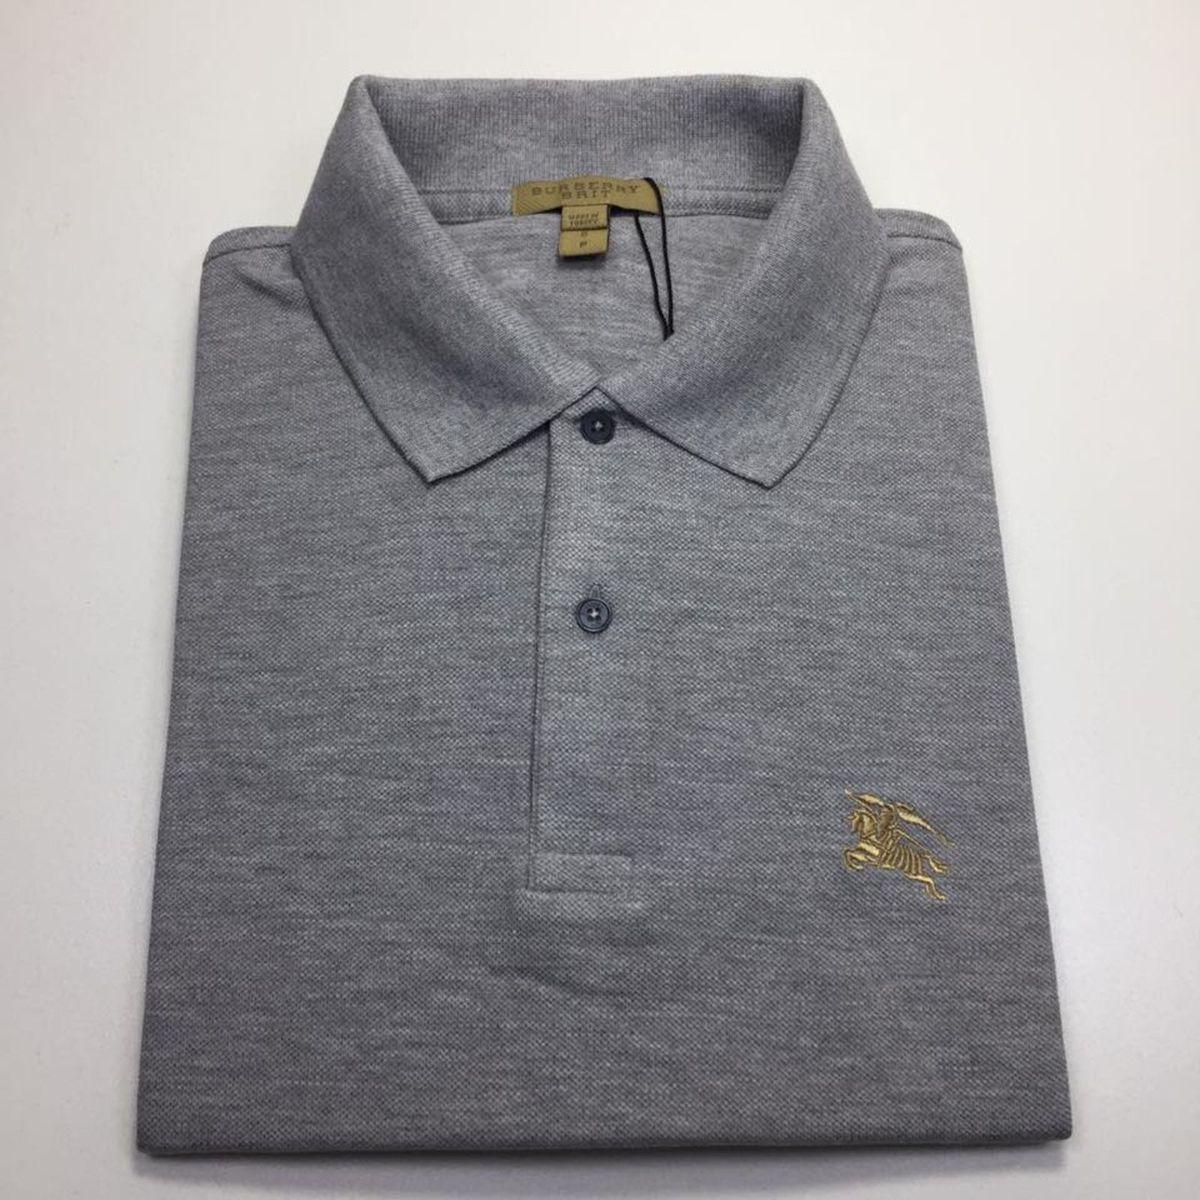 60def0edcc Camiseta Polo Burberry